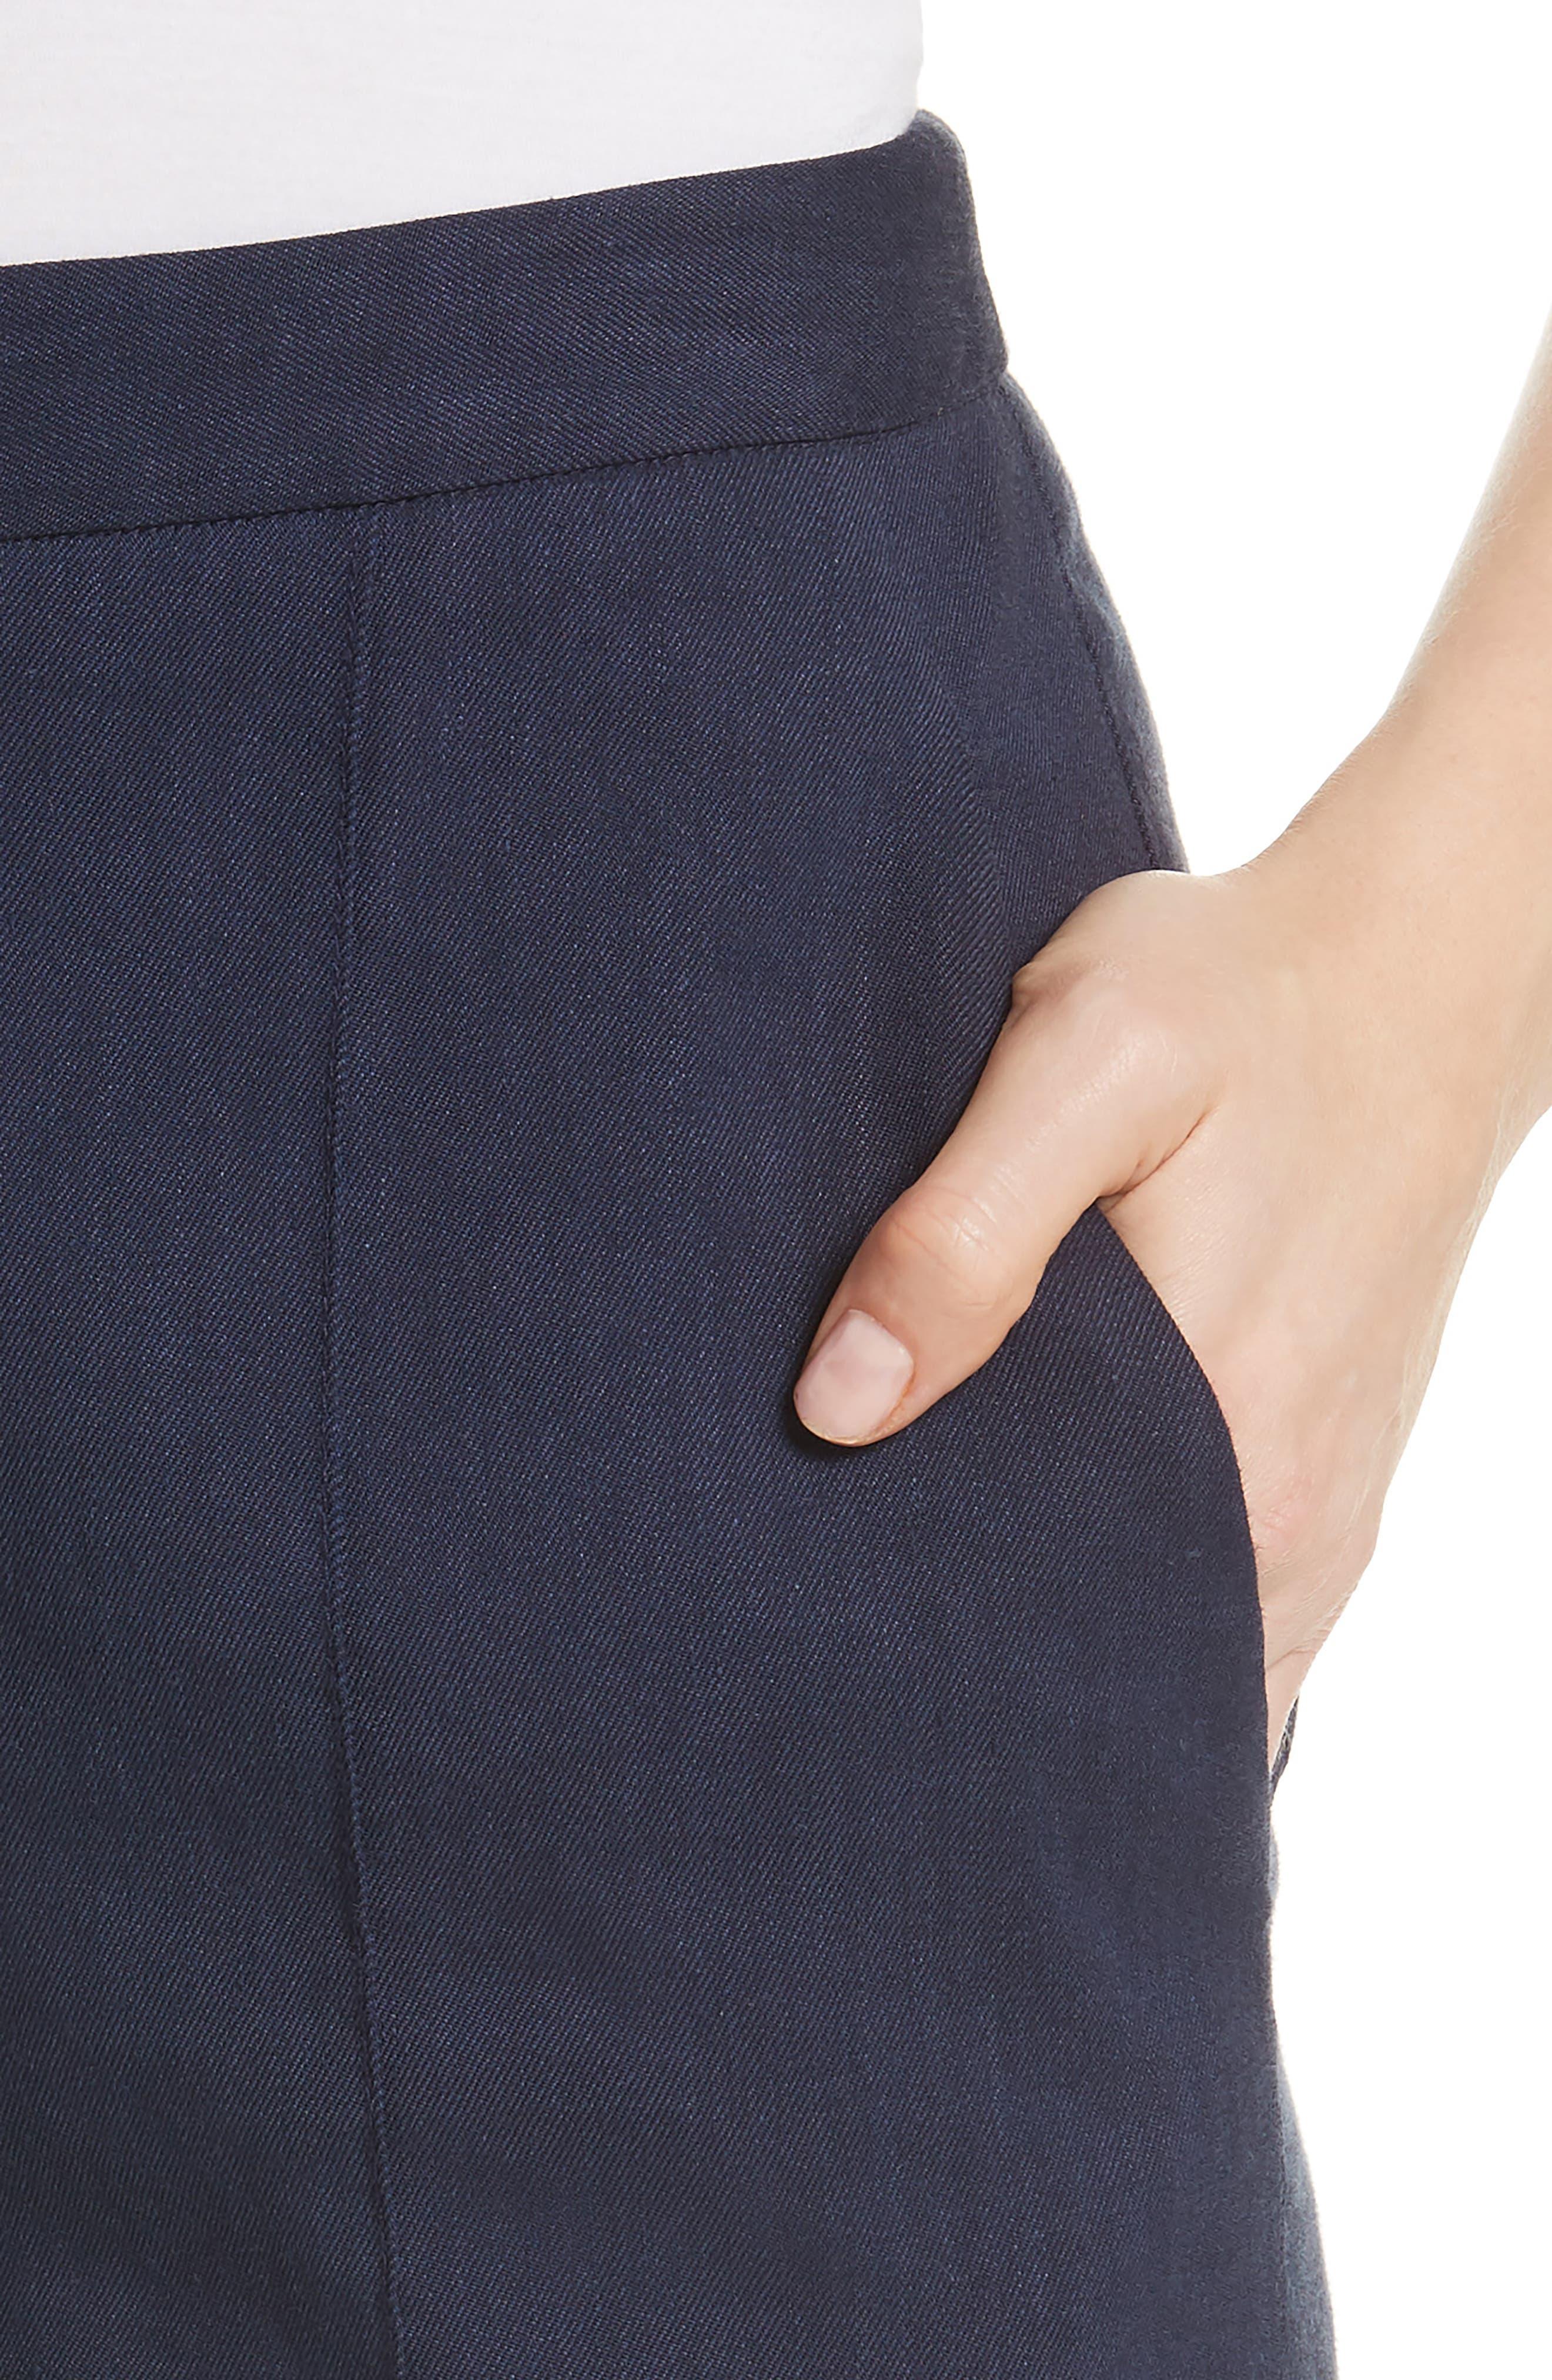 Diane von Furstenberg Pleat Front Flare Stretch Linen Blend Pants,                             Alternate thumbnail 4, color,                             New Navy